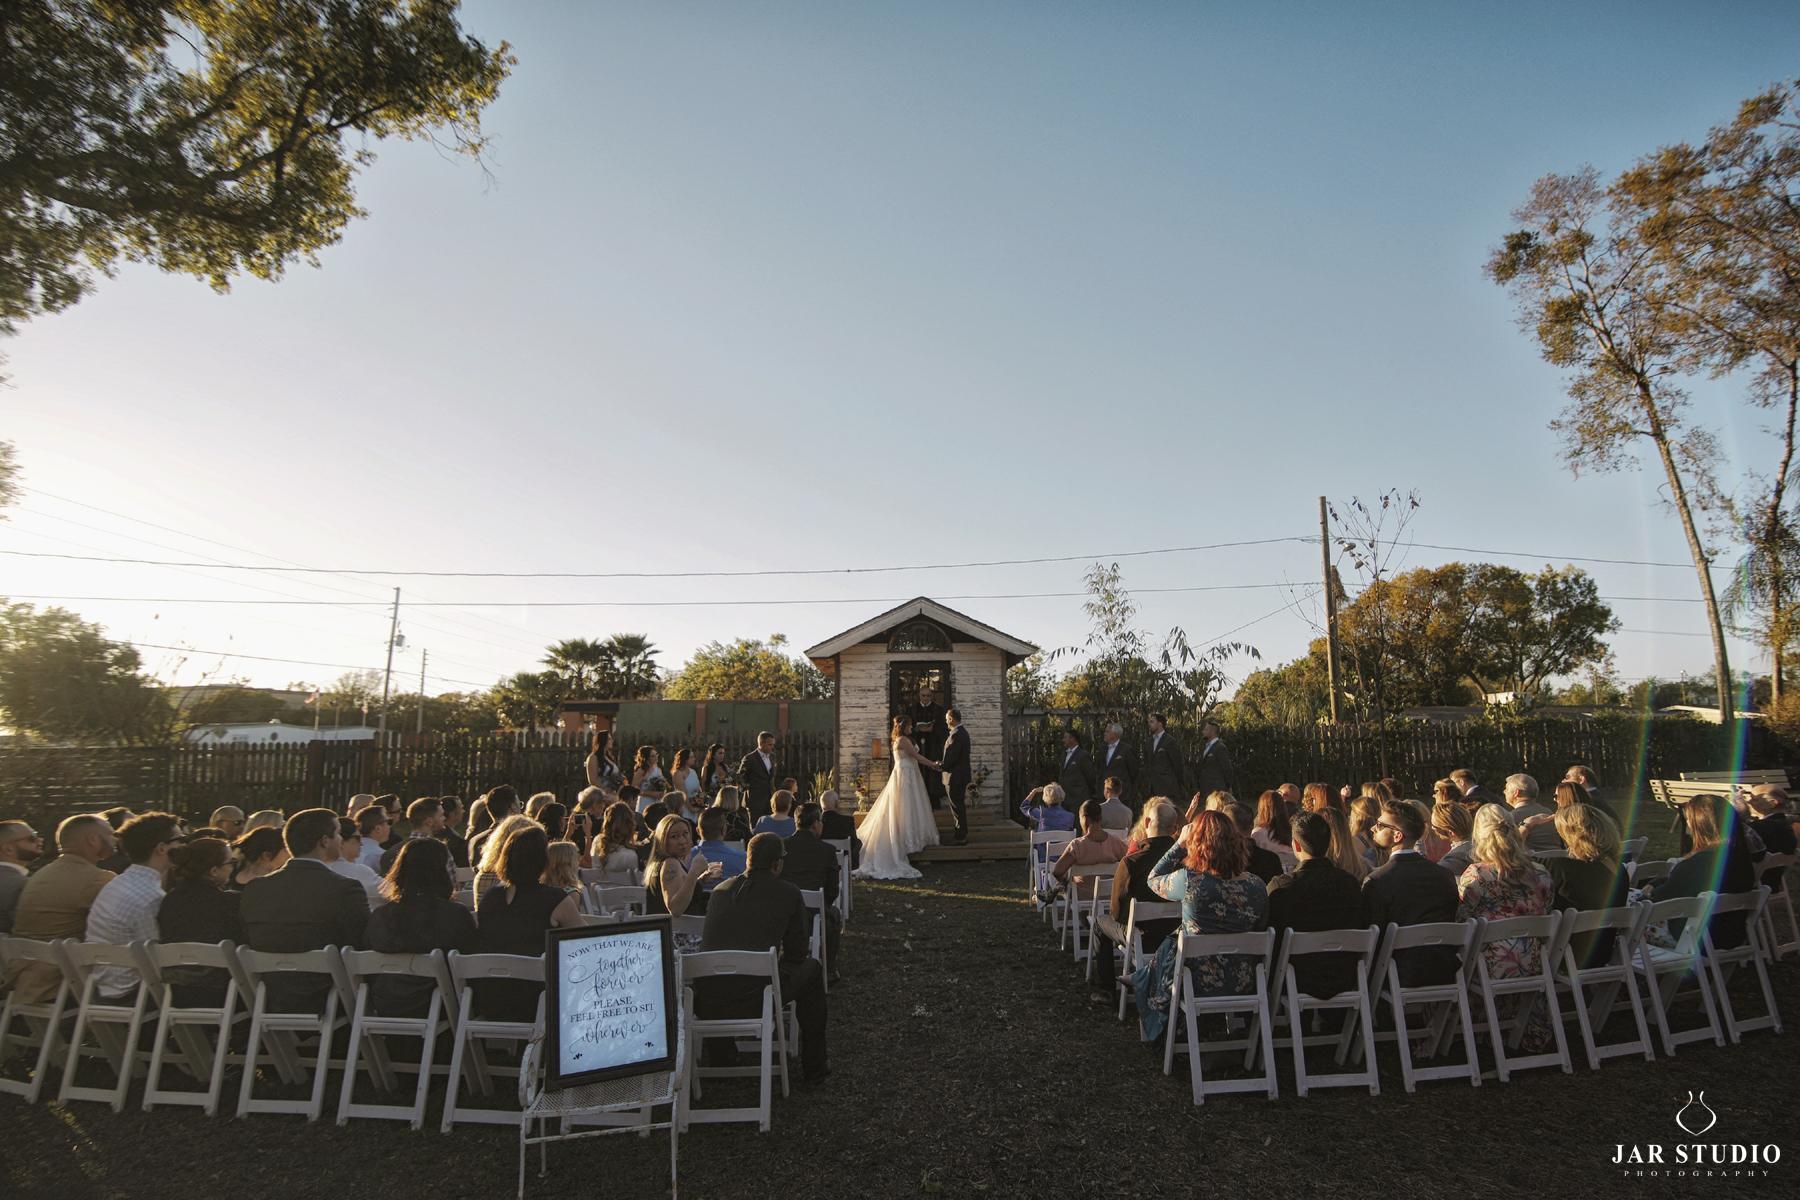 19-together-forever-wedding-ceremony-orlando-photography.JPG